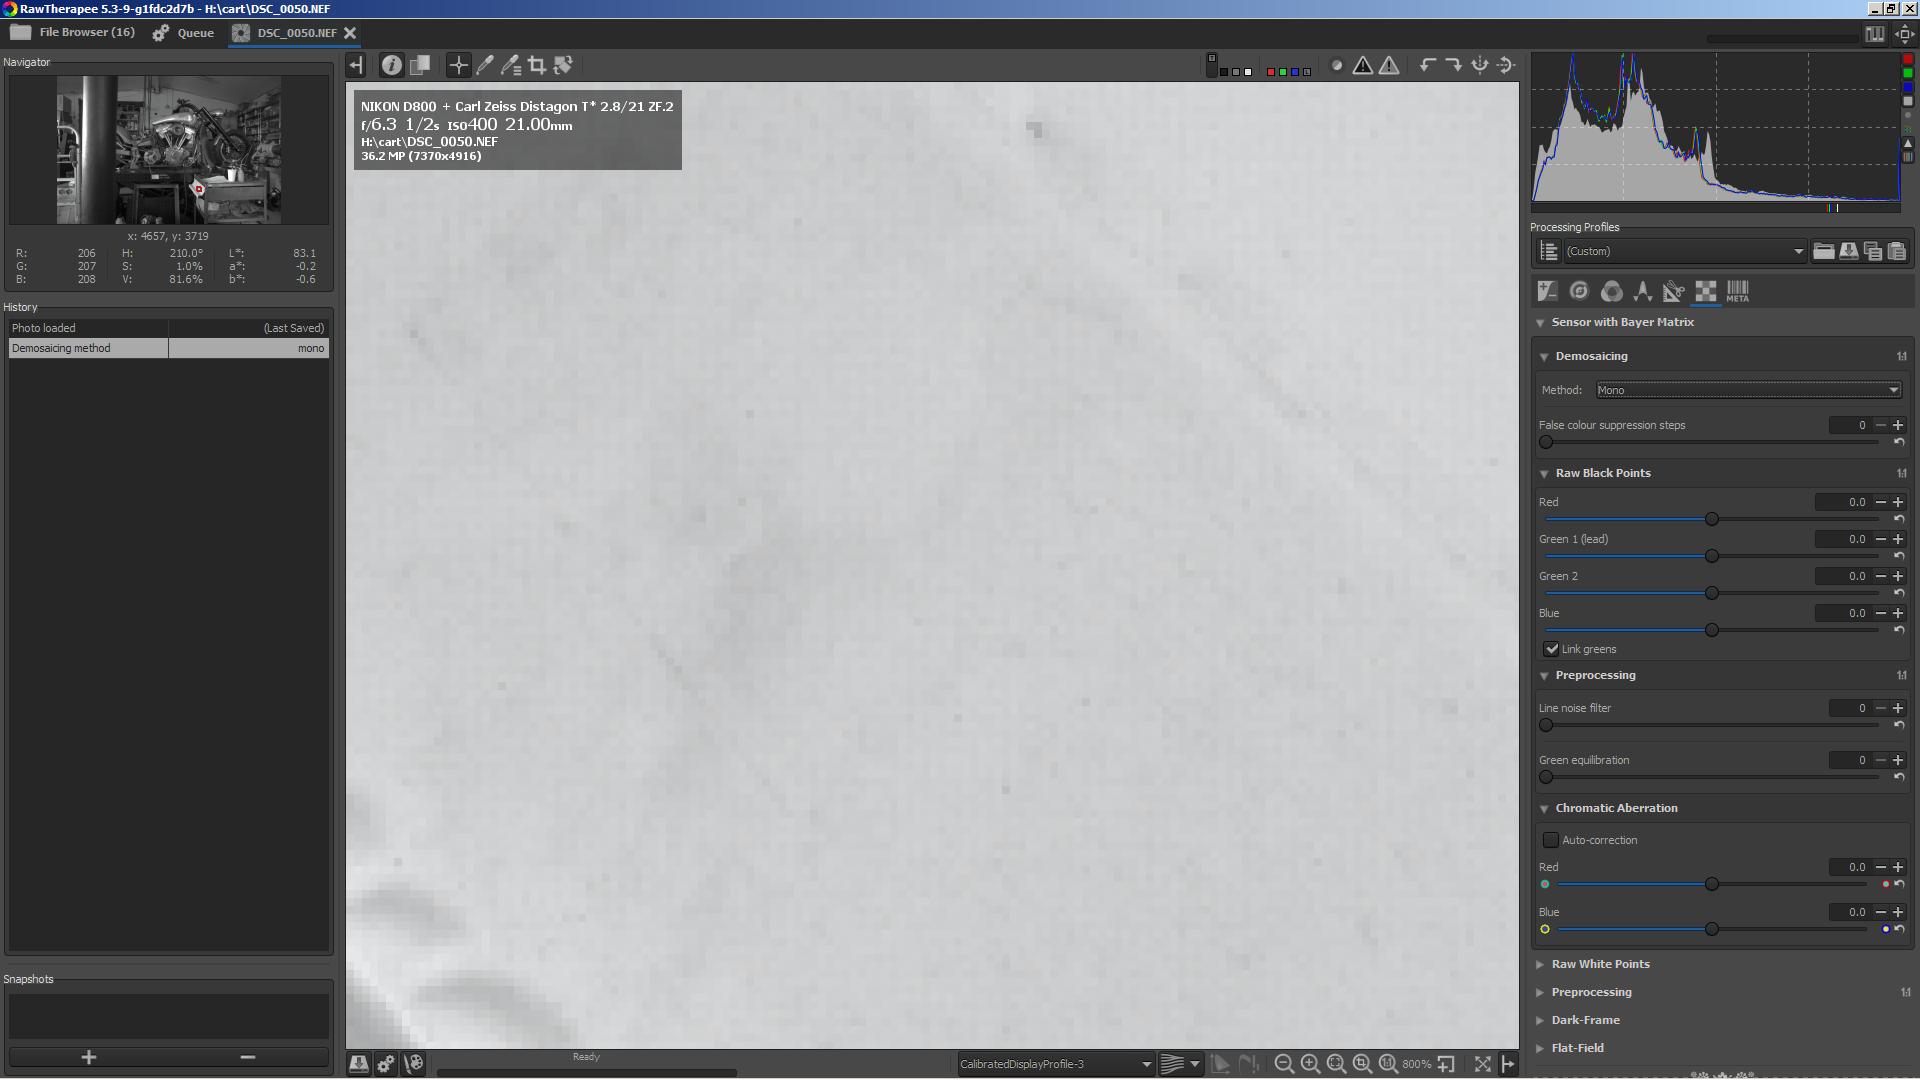 Monochrome Debayer Option with Monochrome Camera - RawTherapee